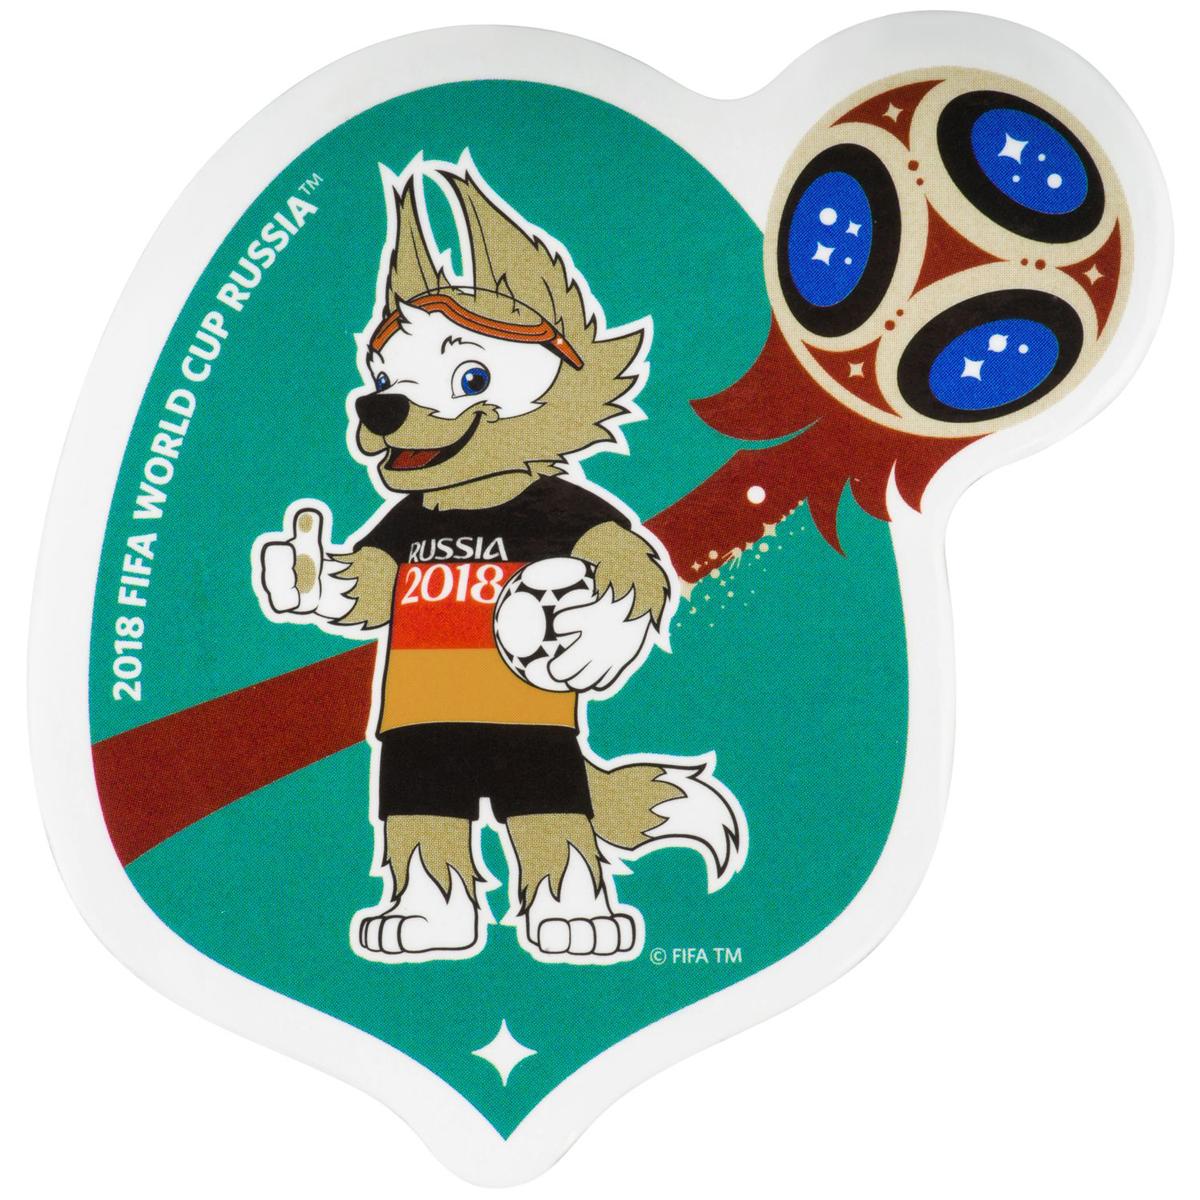 Магнит сувенирный FIFA 2018 Забивака Германия, 8 х 11 см. СН522 магнит fifa 2018 забивака фристайл полистоун сн026